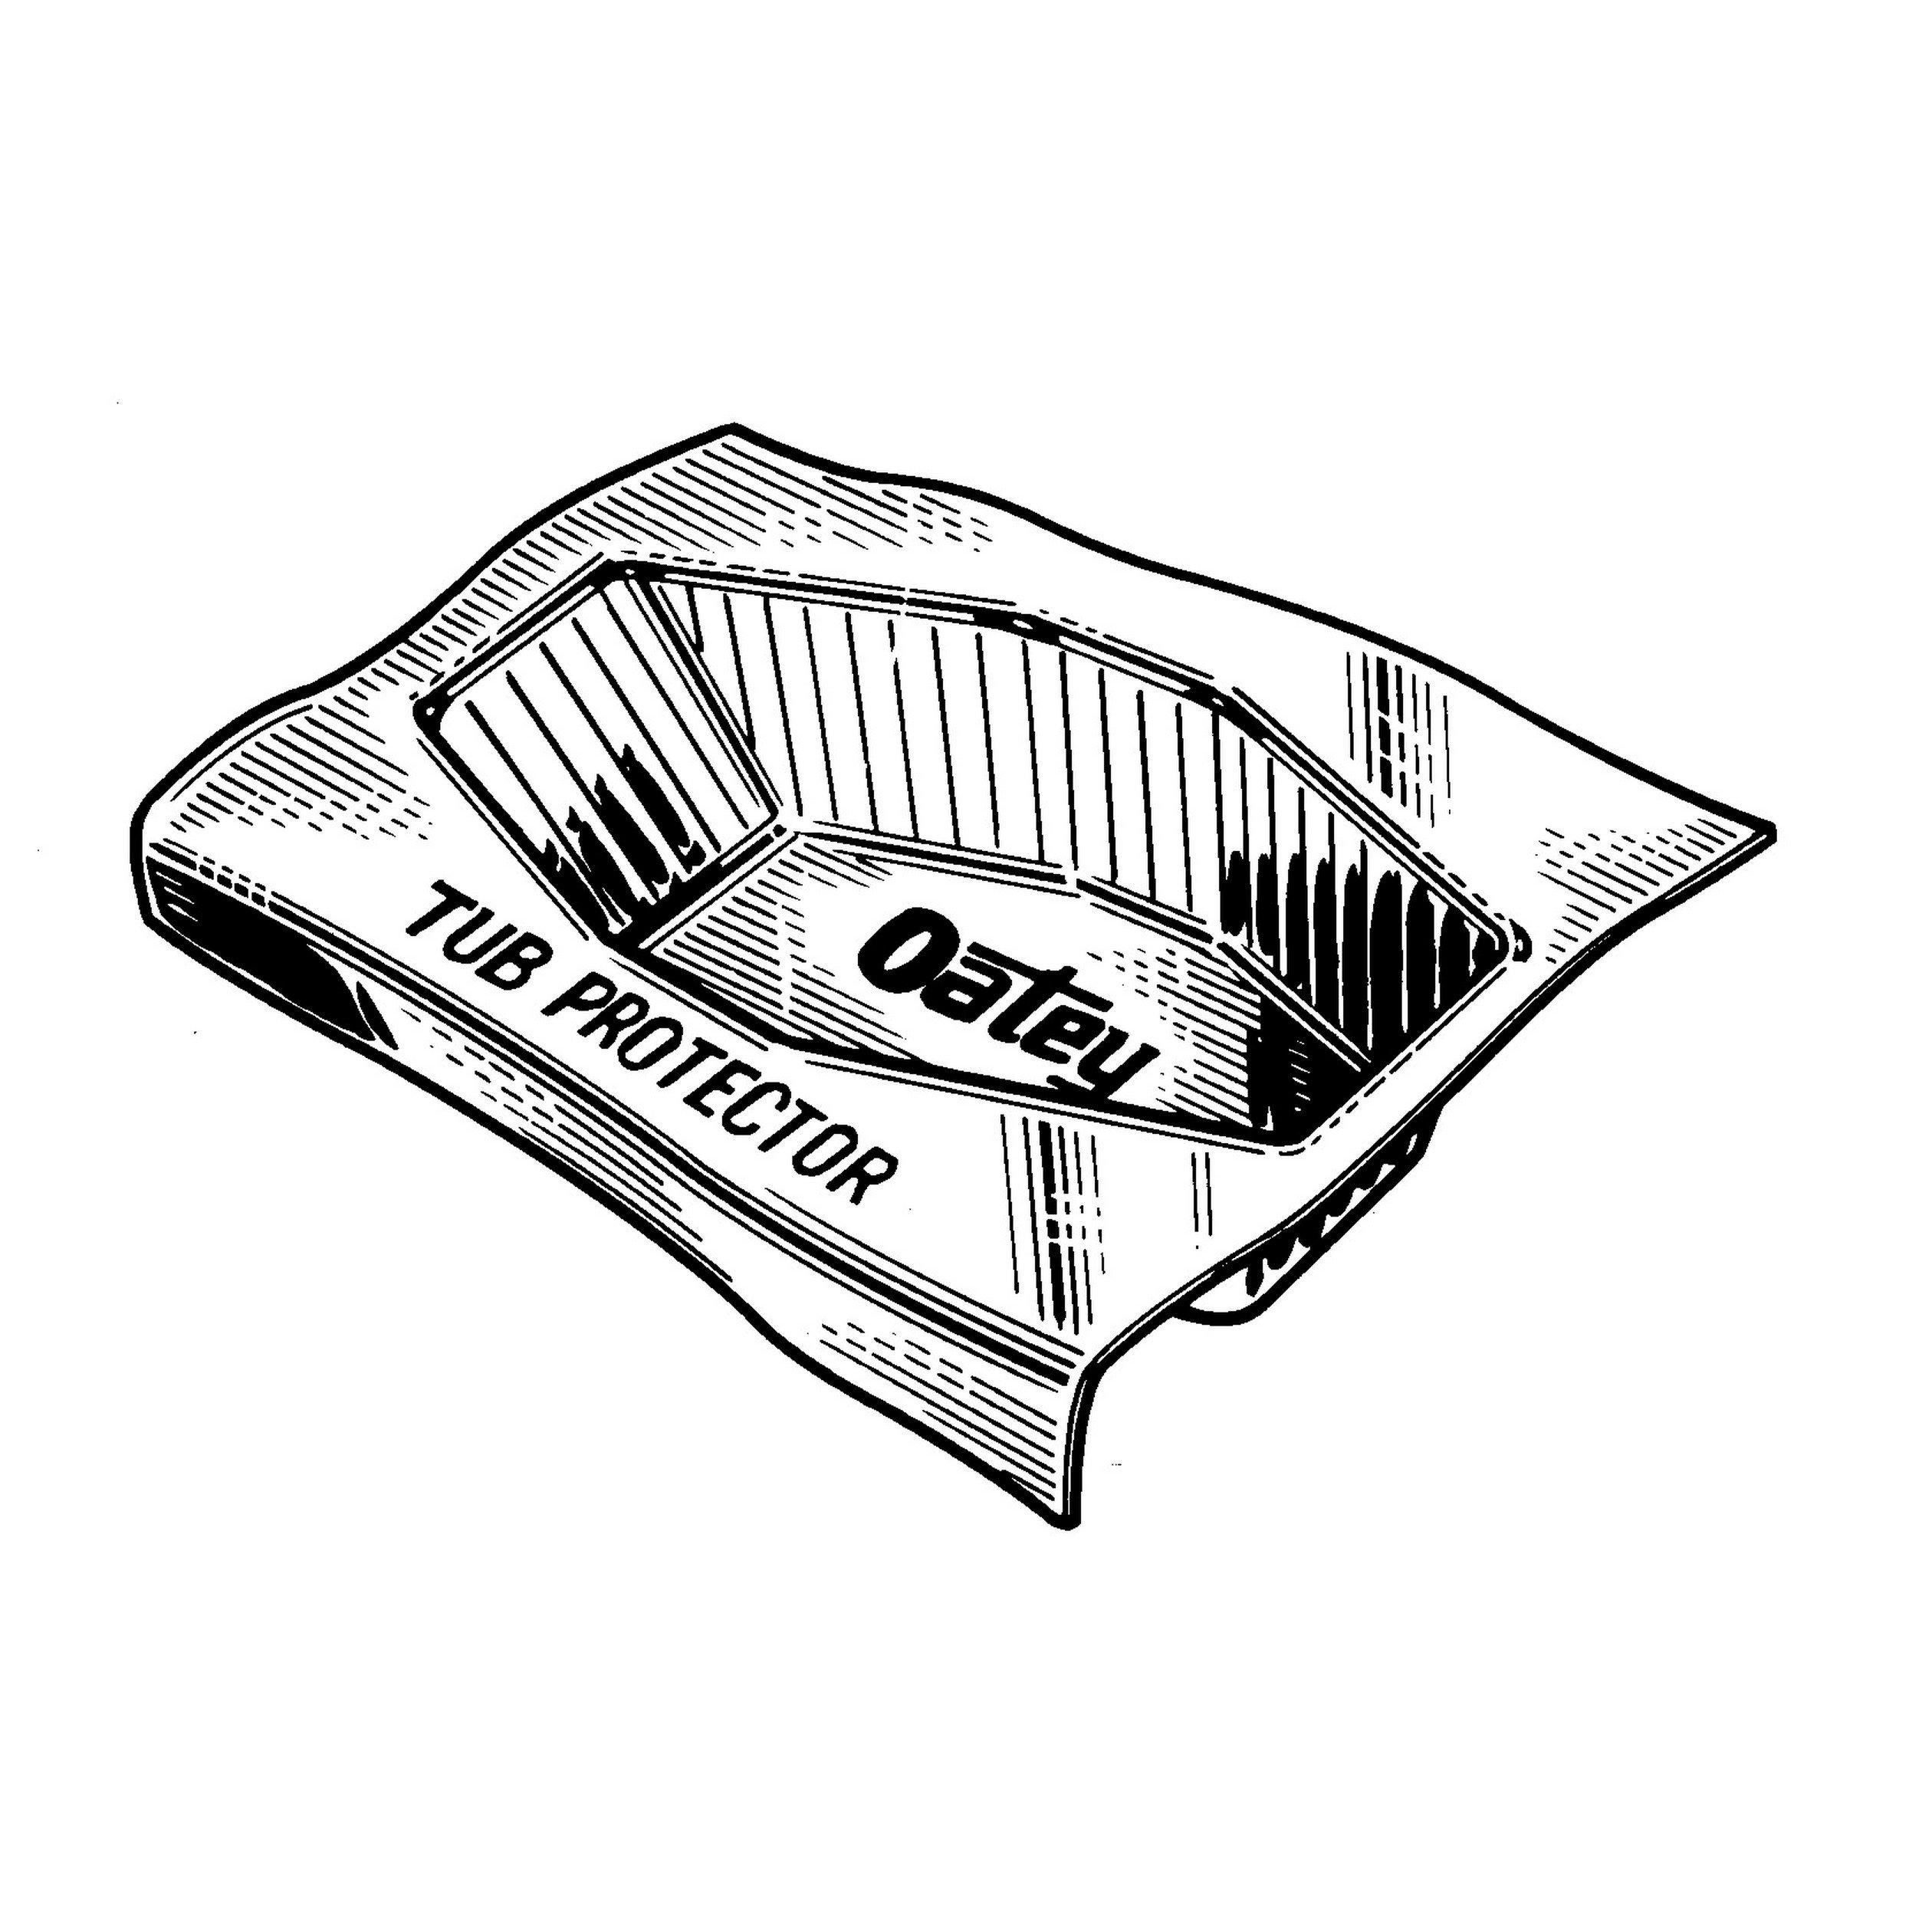 Oatey 34068 15-Inch Deep/57-Inch Long Fits 14-Inch Tubs 15-Inch